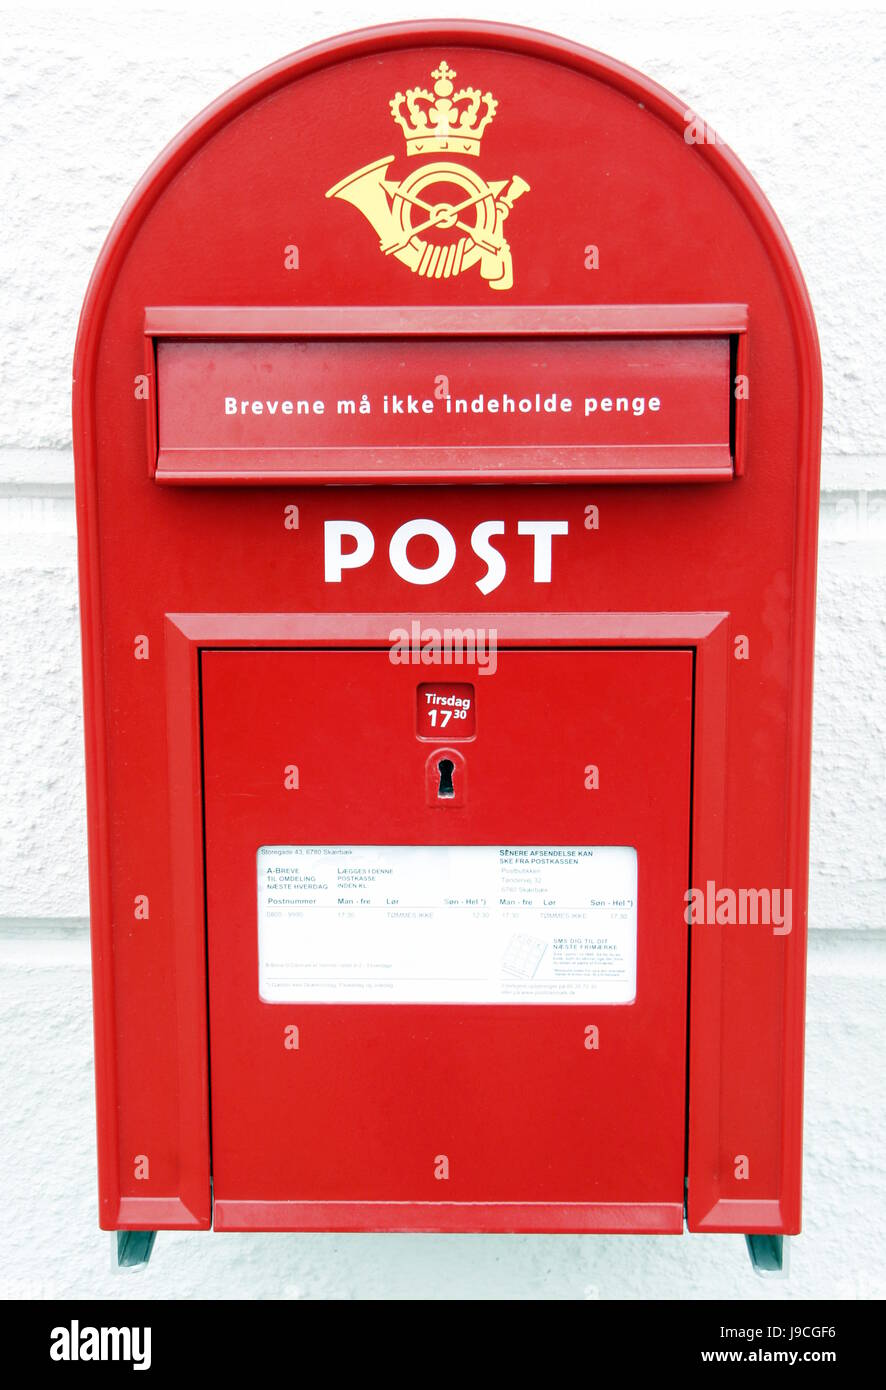 Dänemark Krone Postkarte Brief E Mail Postfach Rot Post